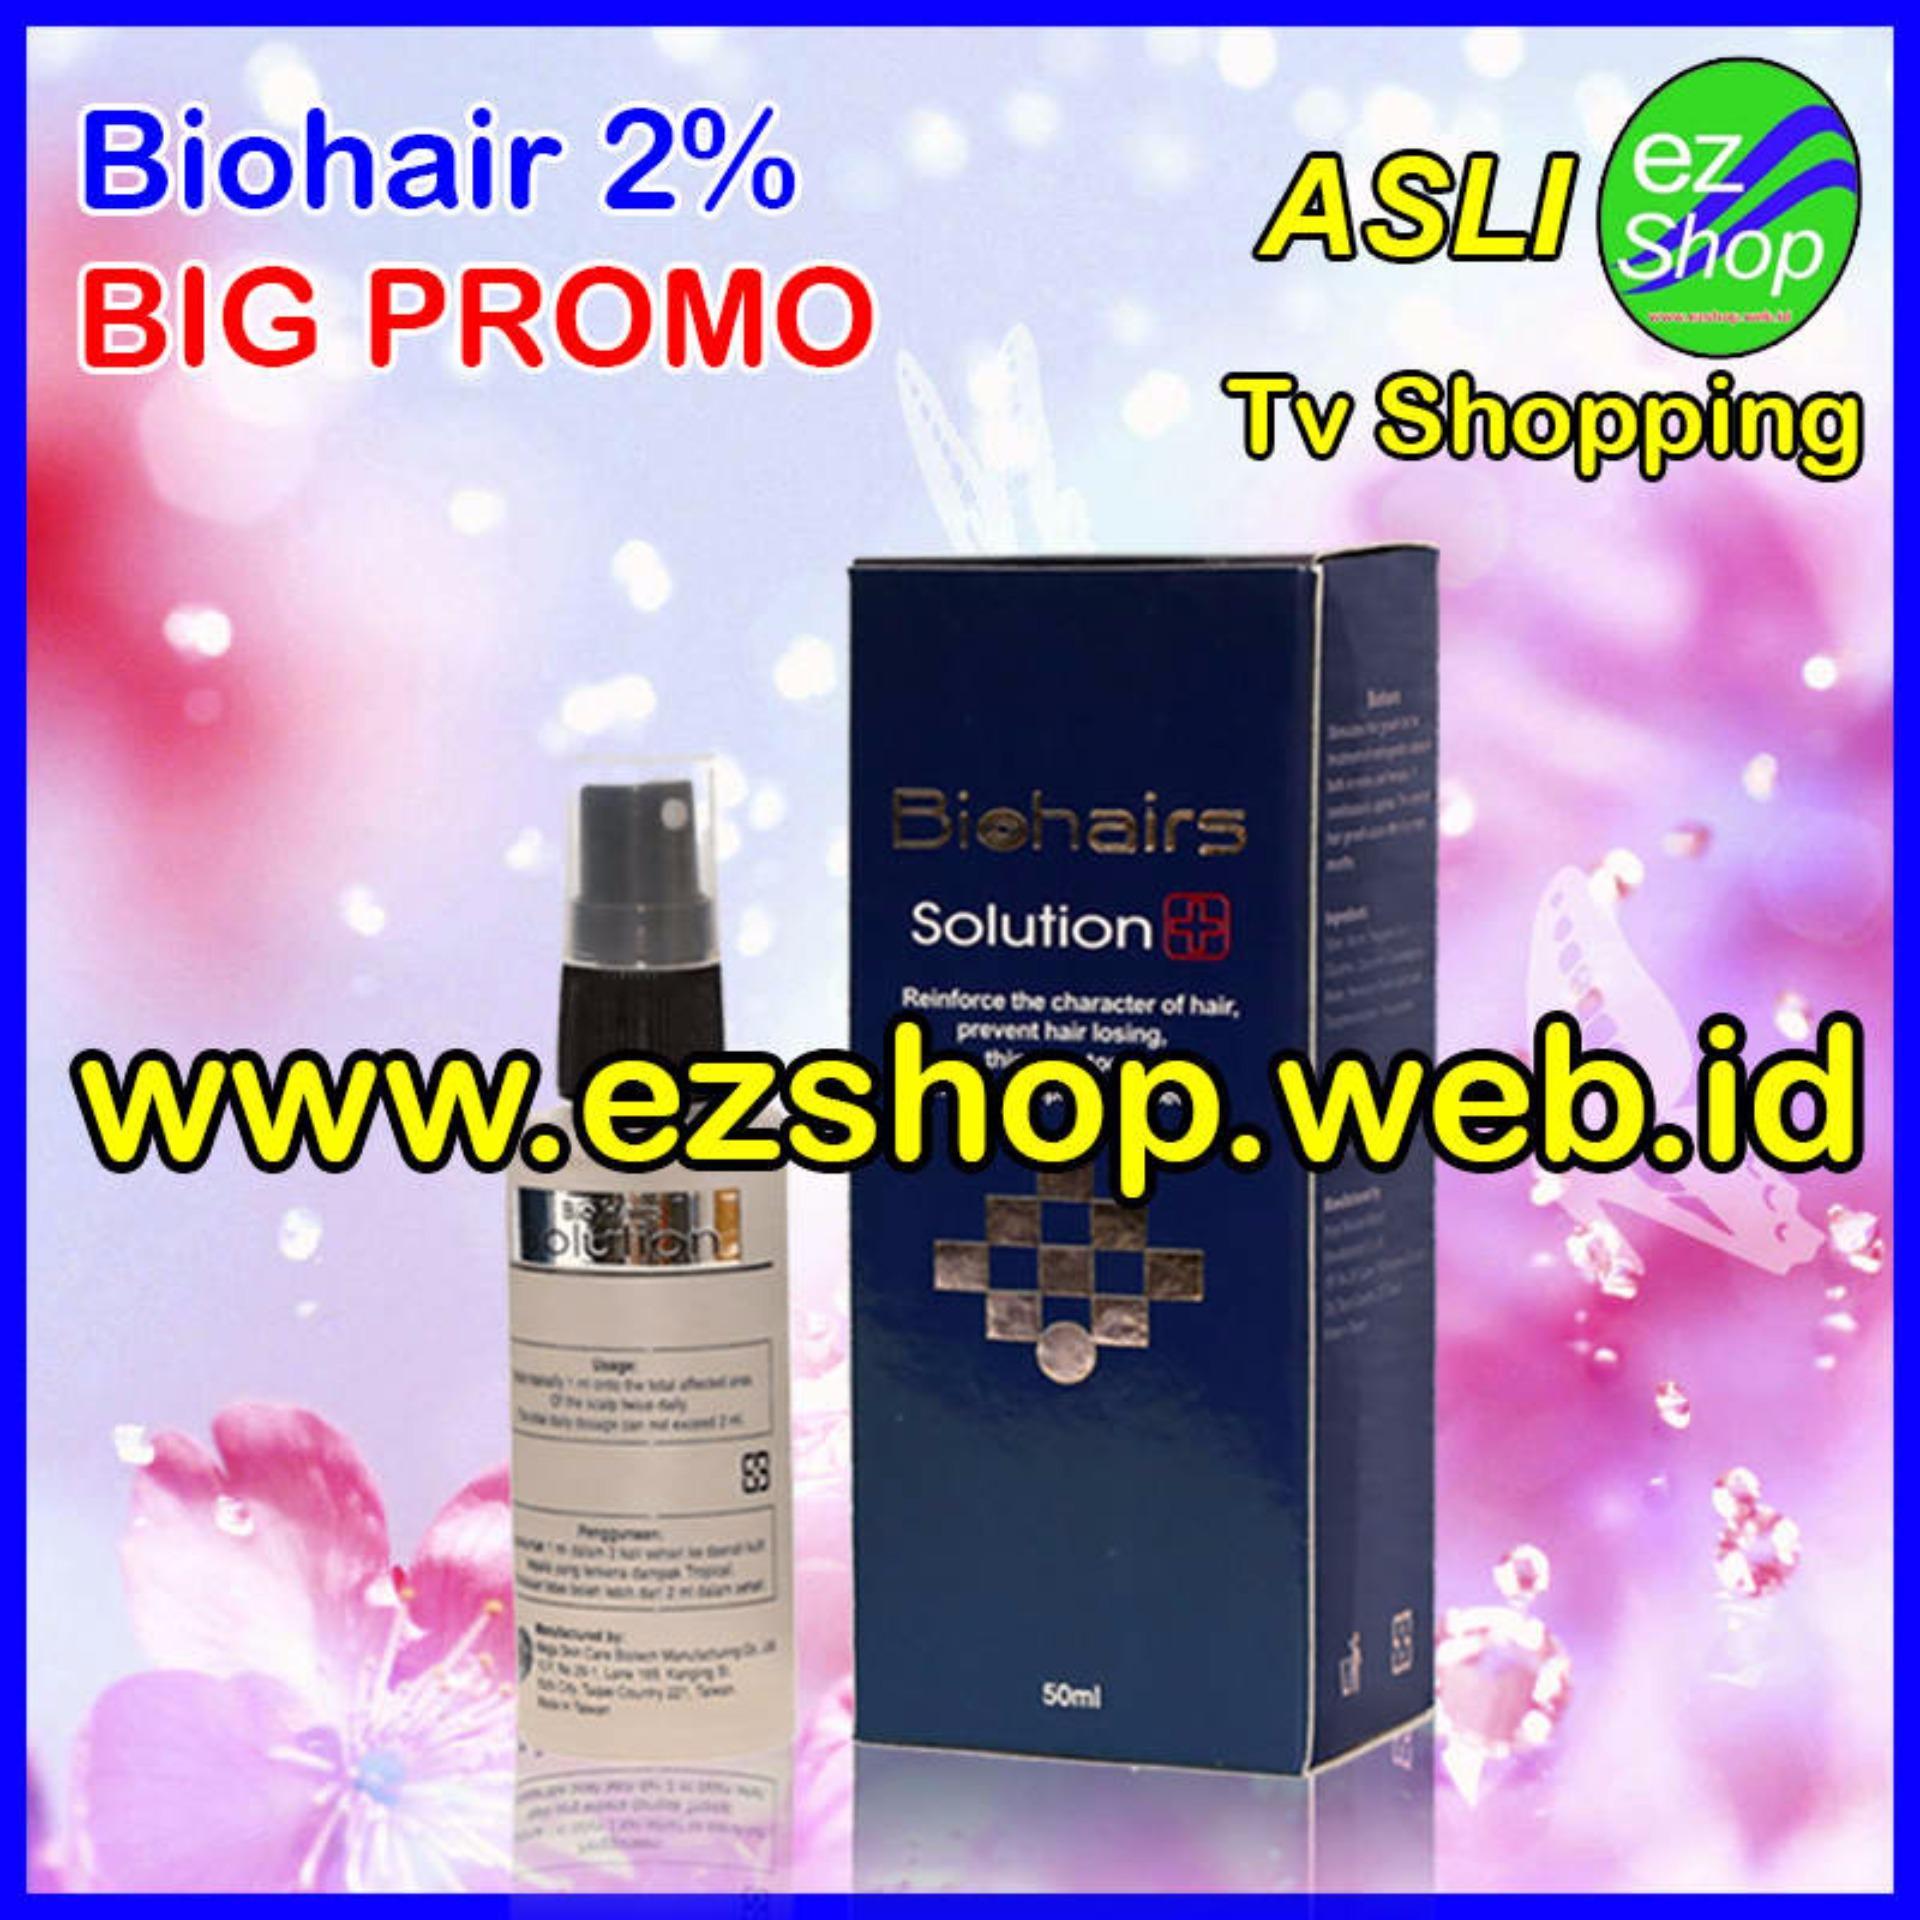 Flash Sale Biohairs Solution 2% - Tonic / Serum / Obat Penumbuh Rambut Alami (Biohair / Bio Hair / Hairs Shampoo) - Jaminan Asli EzShop - Ez Shop Tv Home ...